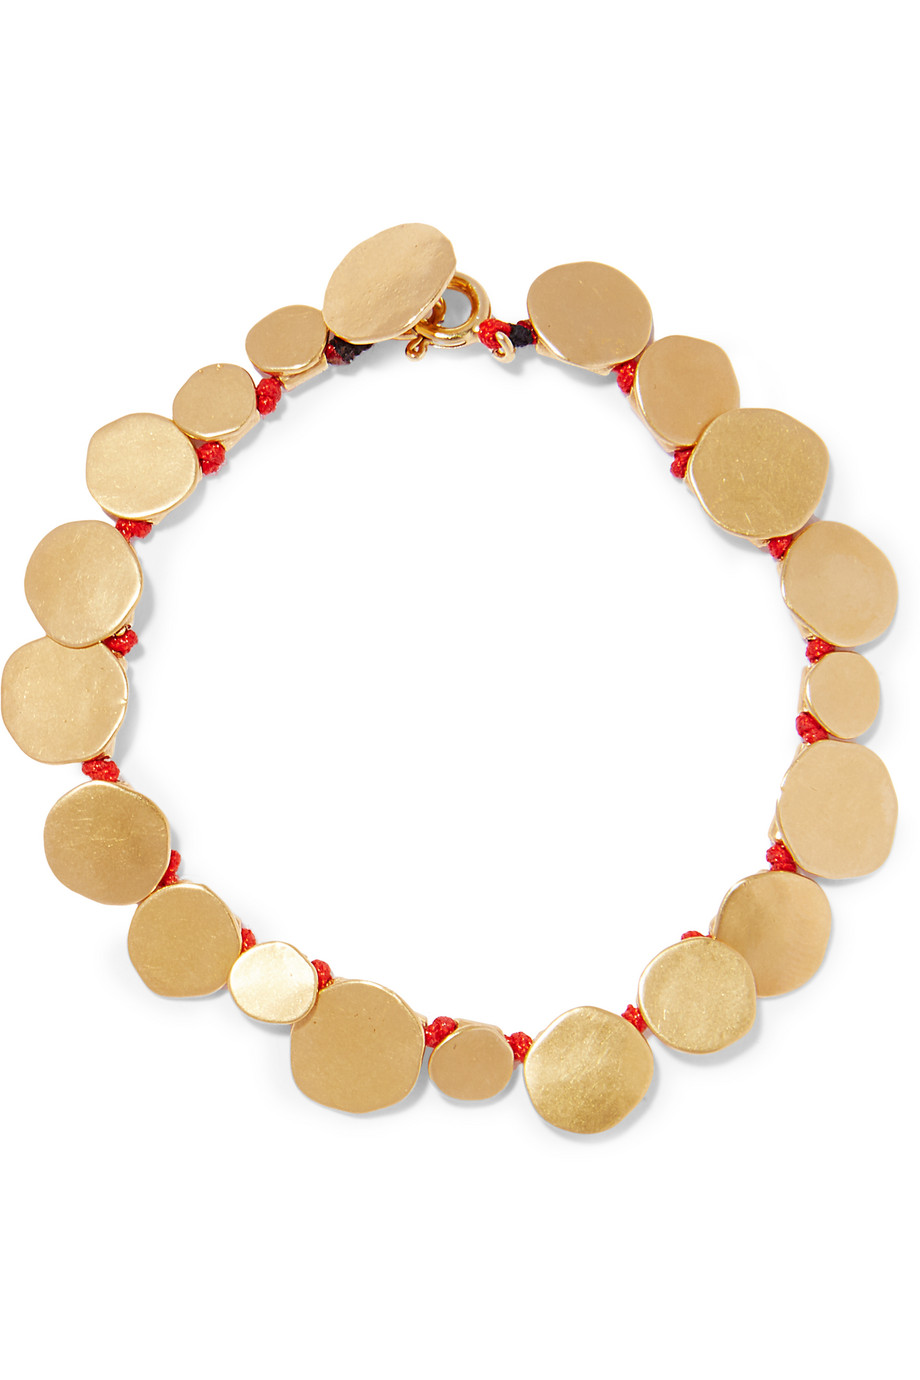 Gold-Plated Bracelet, Women's